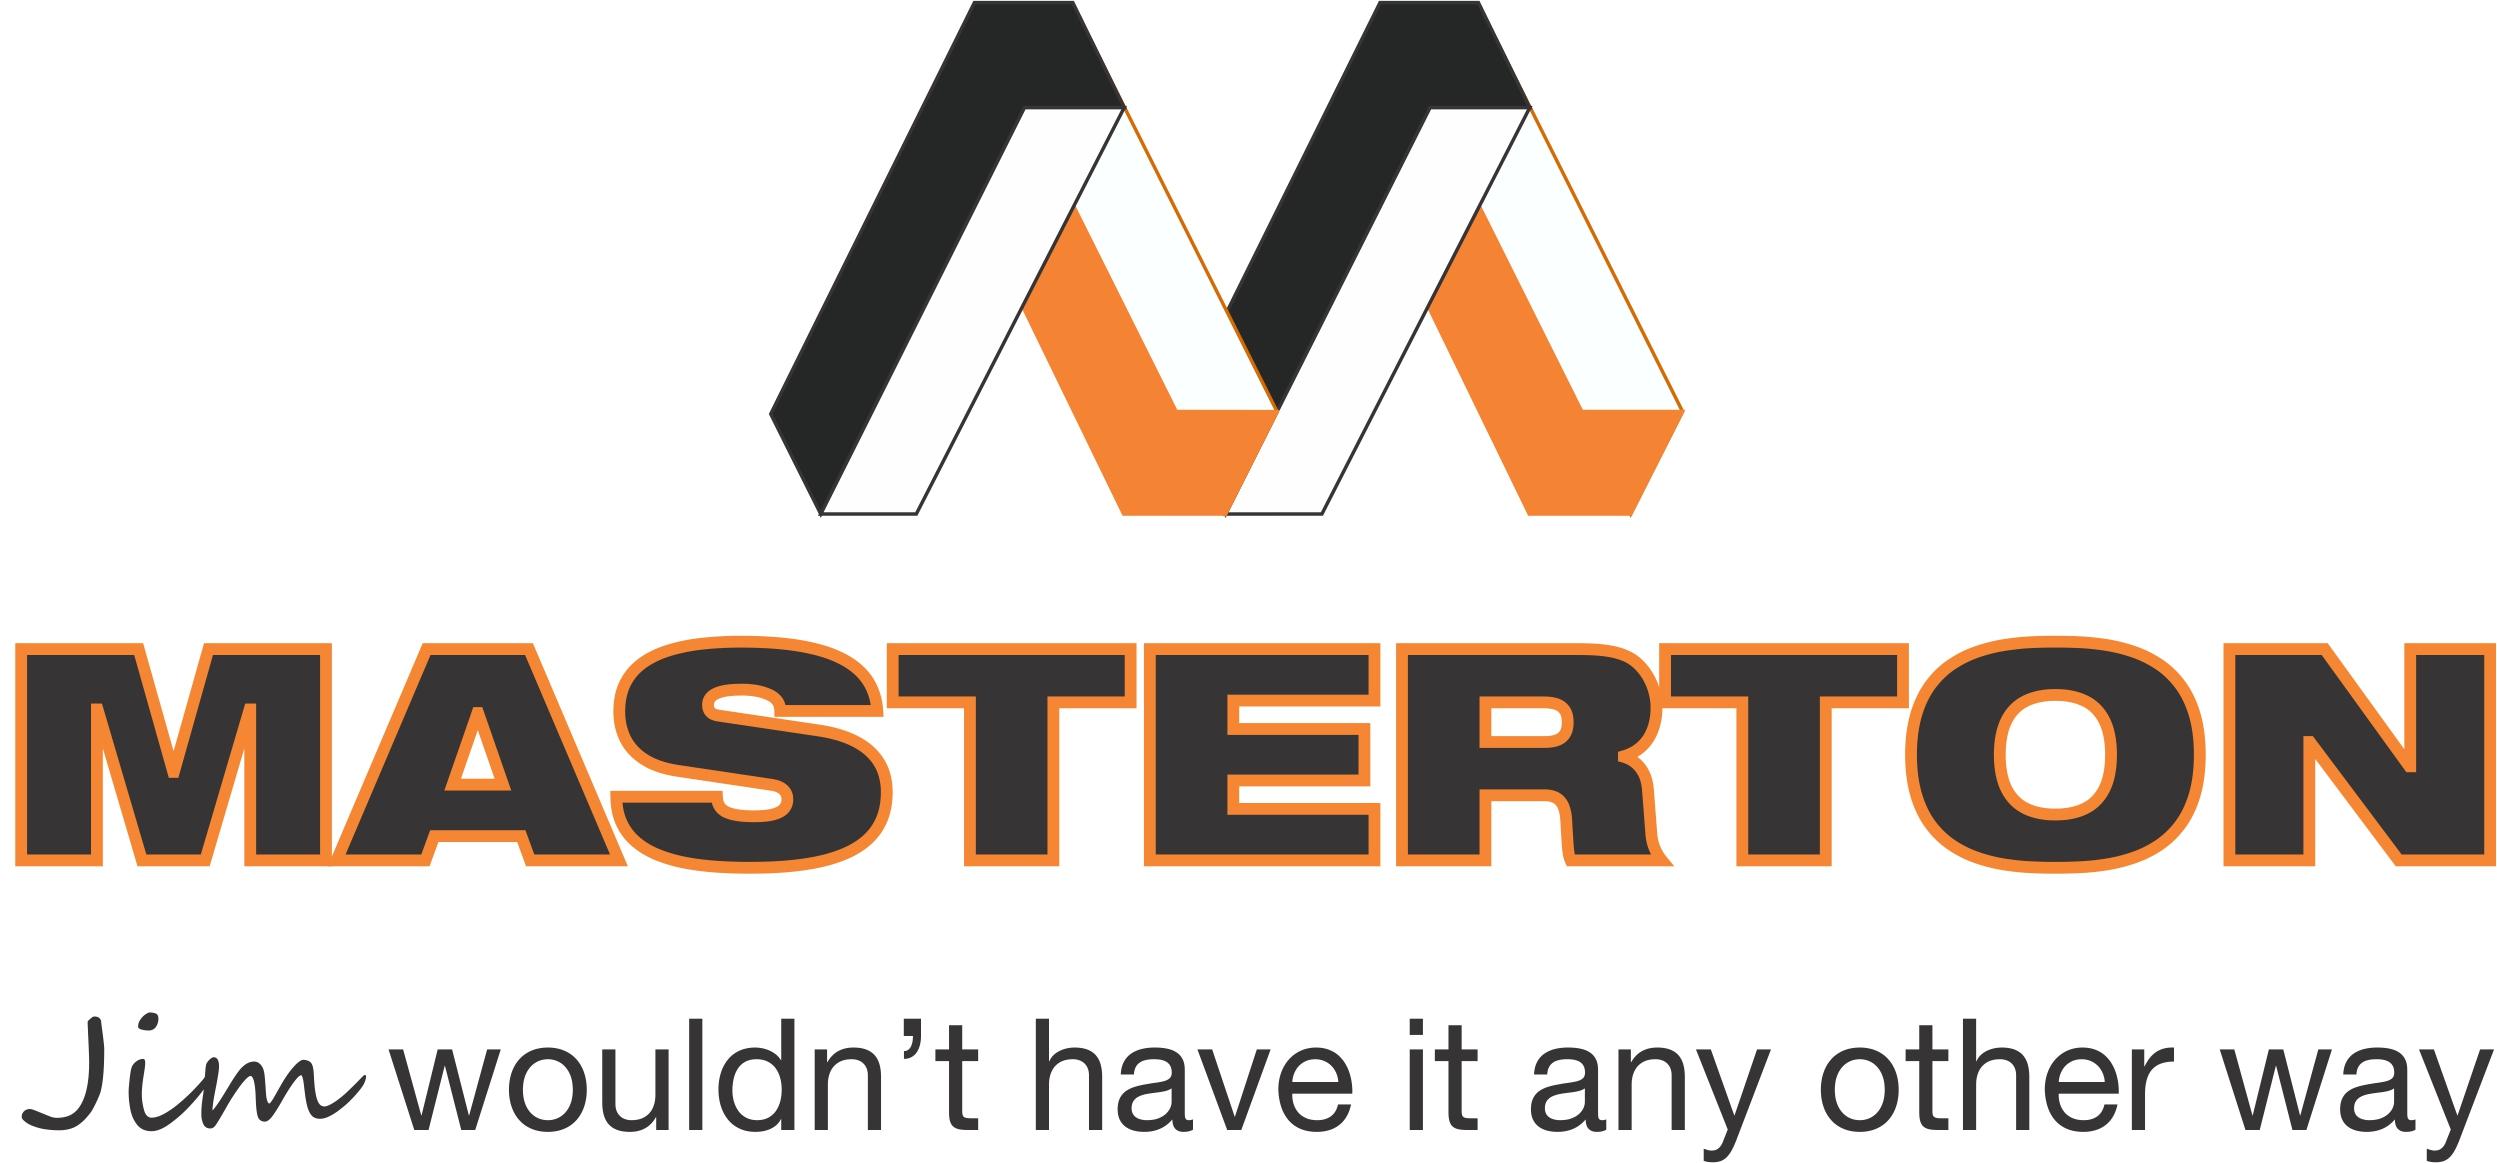 Masterton Homes Reviews - ProductReview.com.au